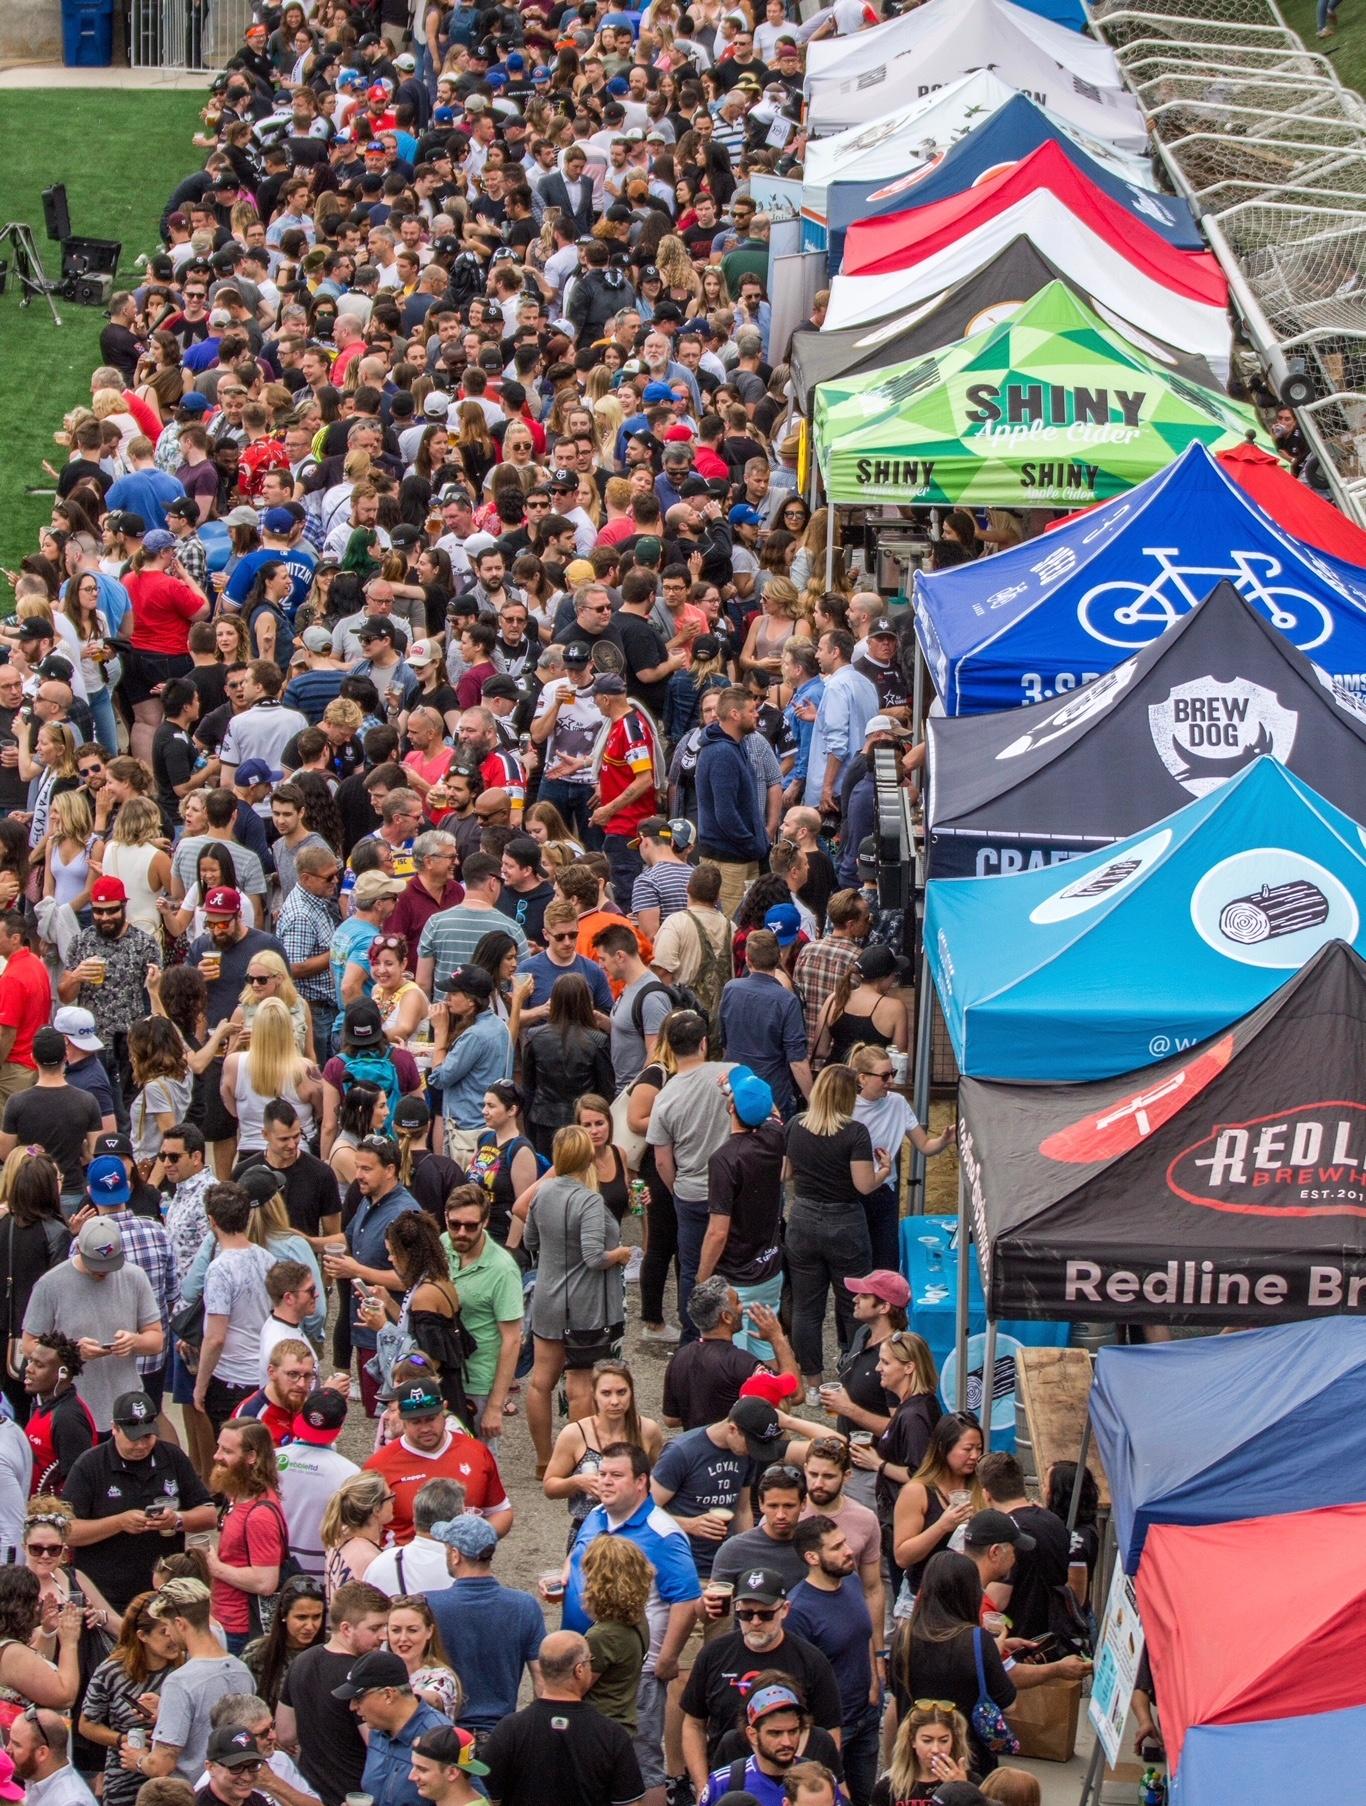 toronto wolfpack rugby beer festival